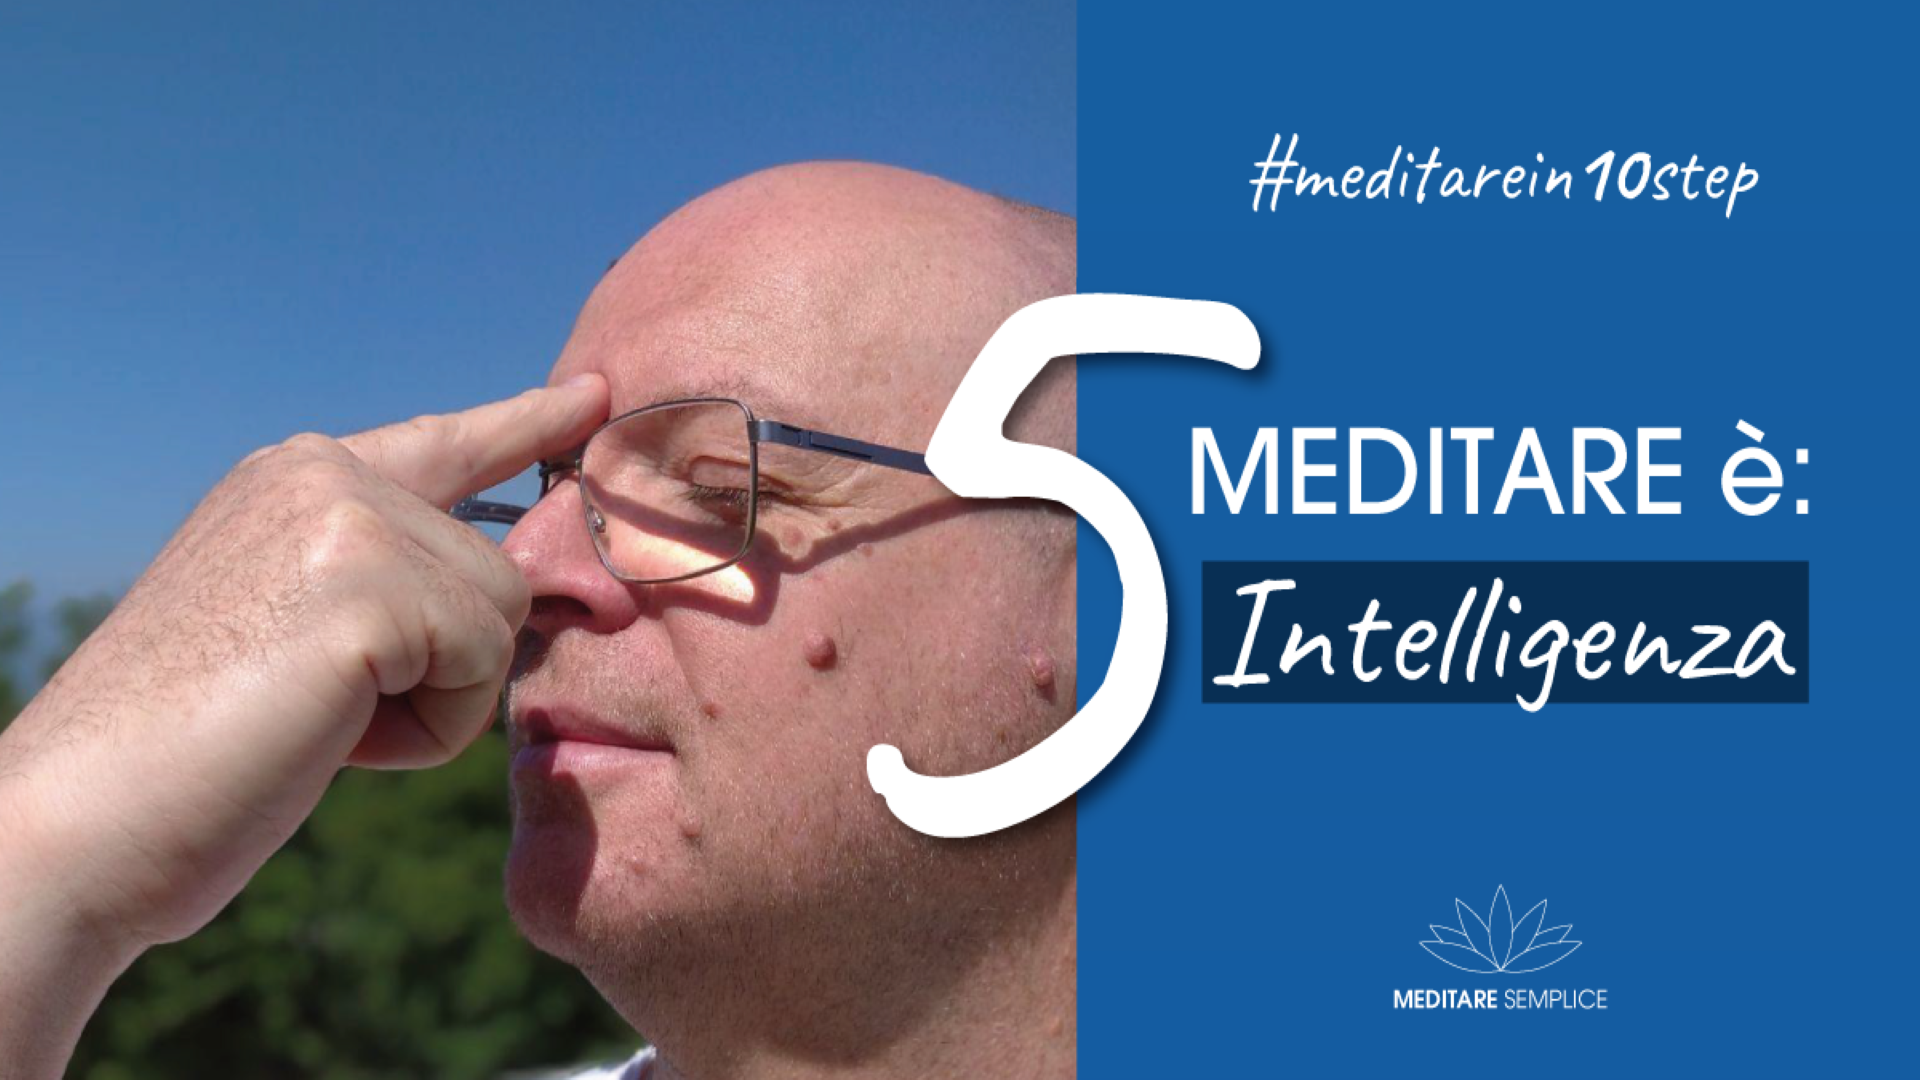 https://meditaedanza.com/wp-content/uploads/2020/09/5-meditare-ä-intelligenza-foto.png